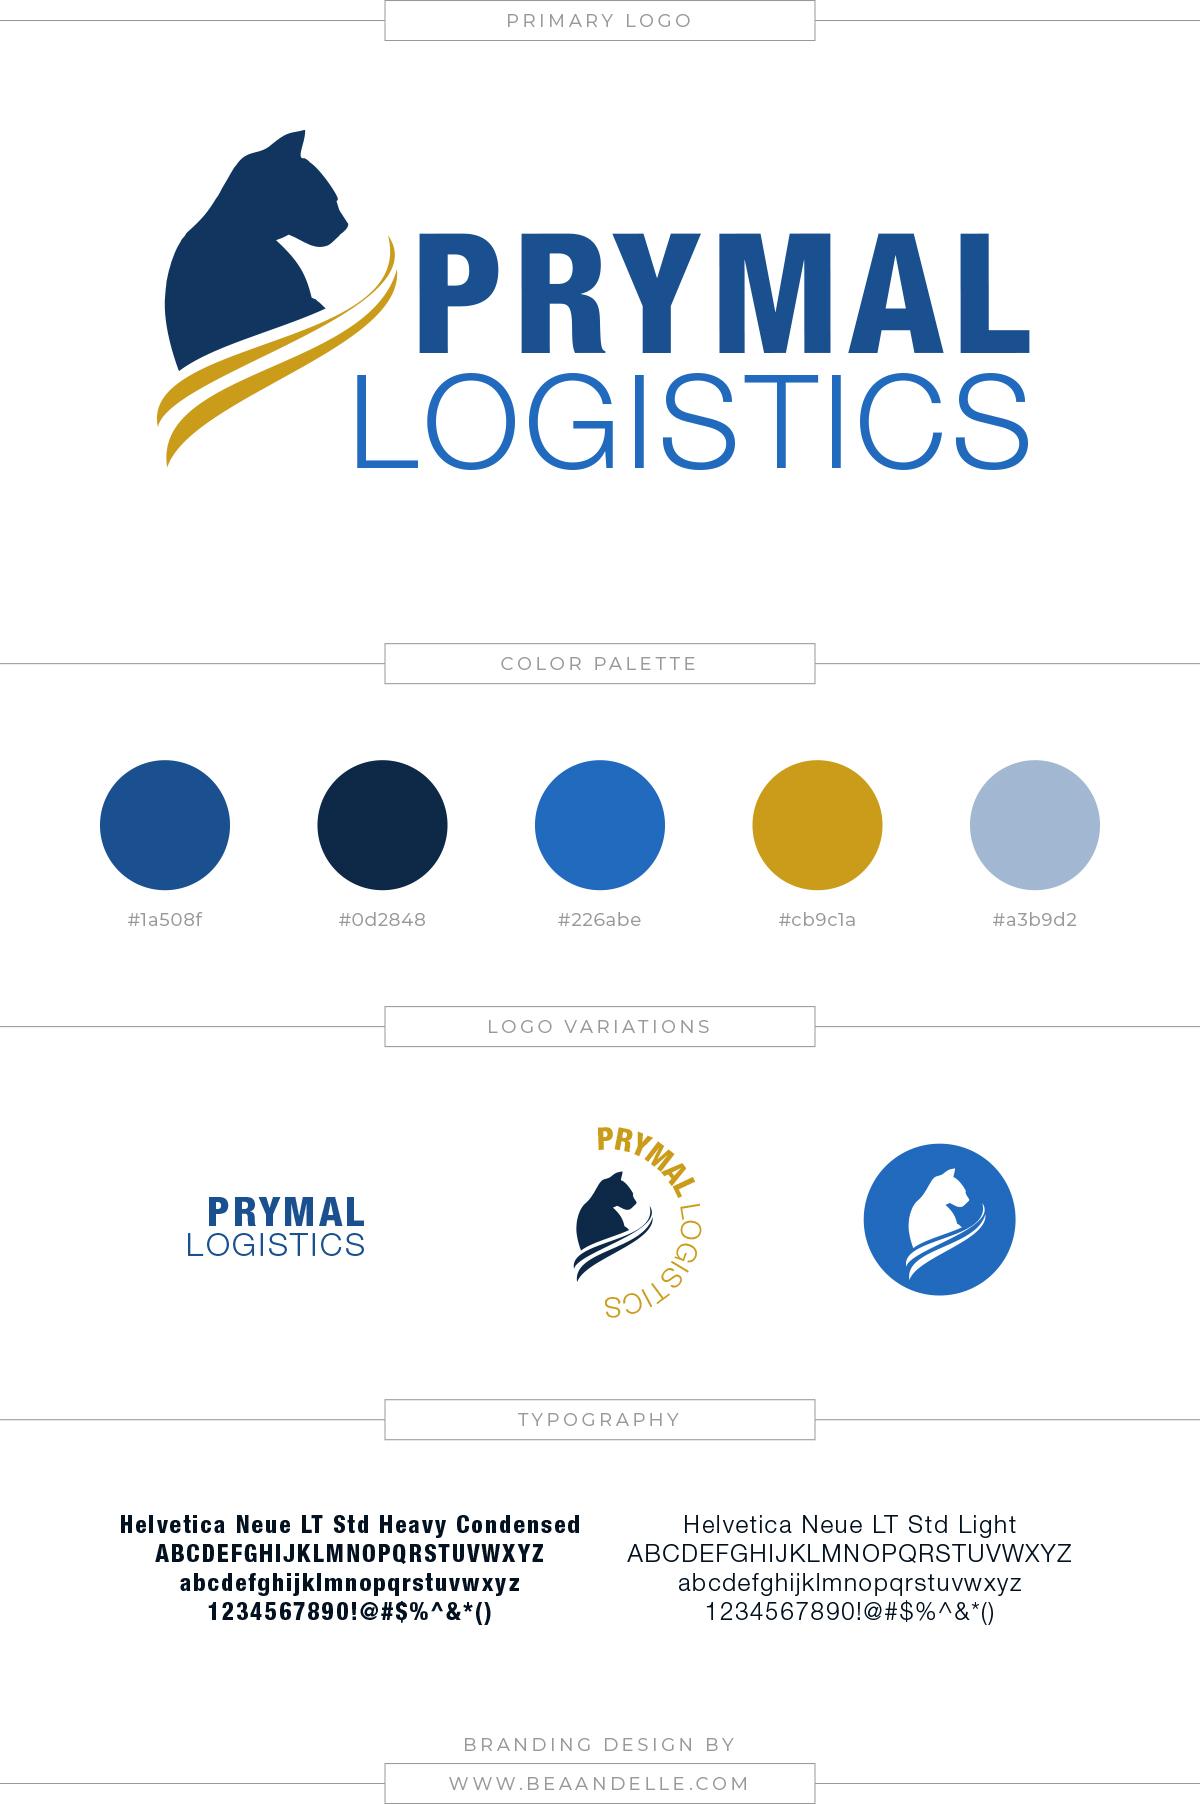 Prymal Logistics mood board